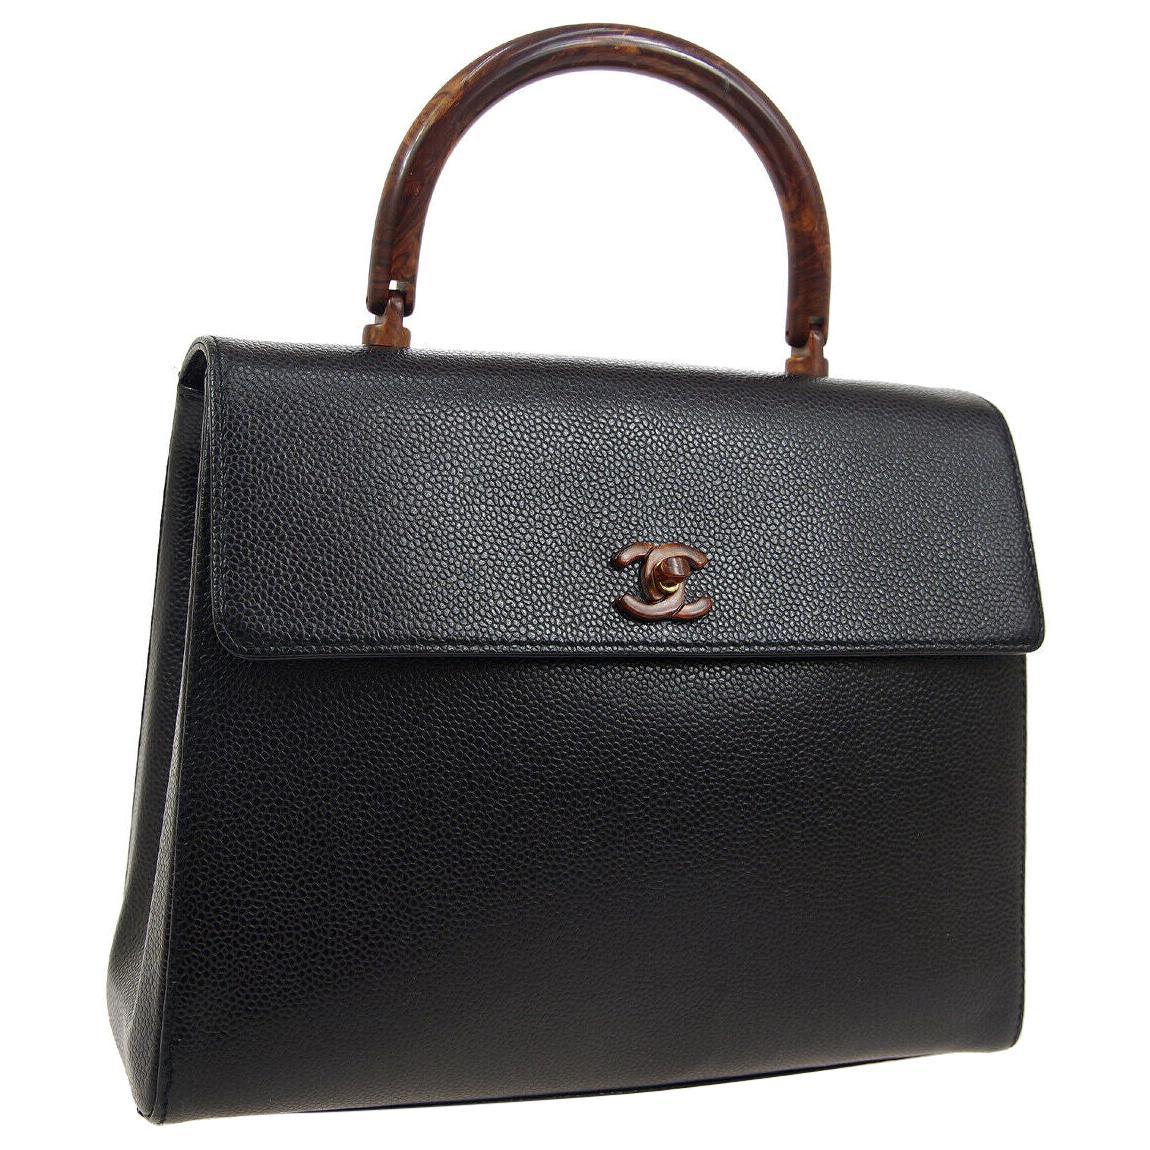 Chanel Black Leather Kelly Brown Tortoise Evening Top Handle Satchel Bag